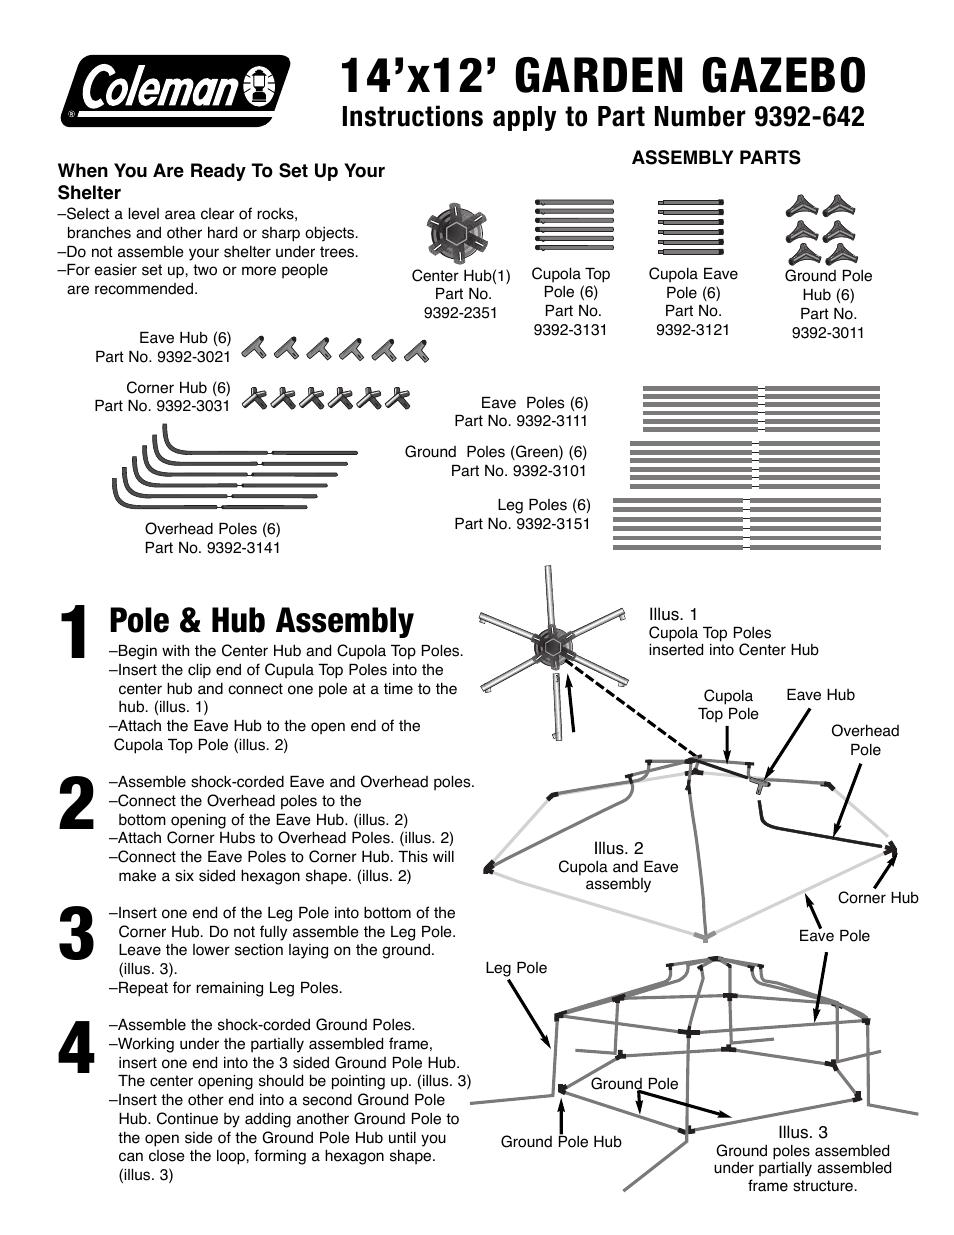 Coleman Garden Gazebo 14x12 User Manual 2 Pages